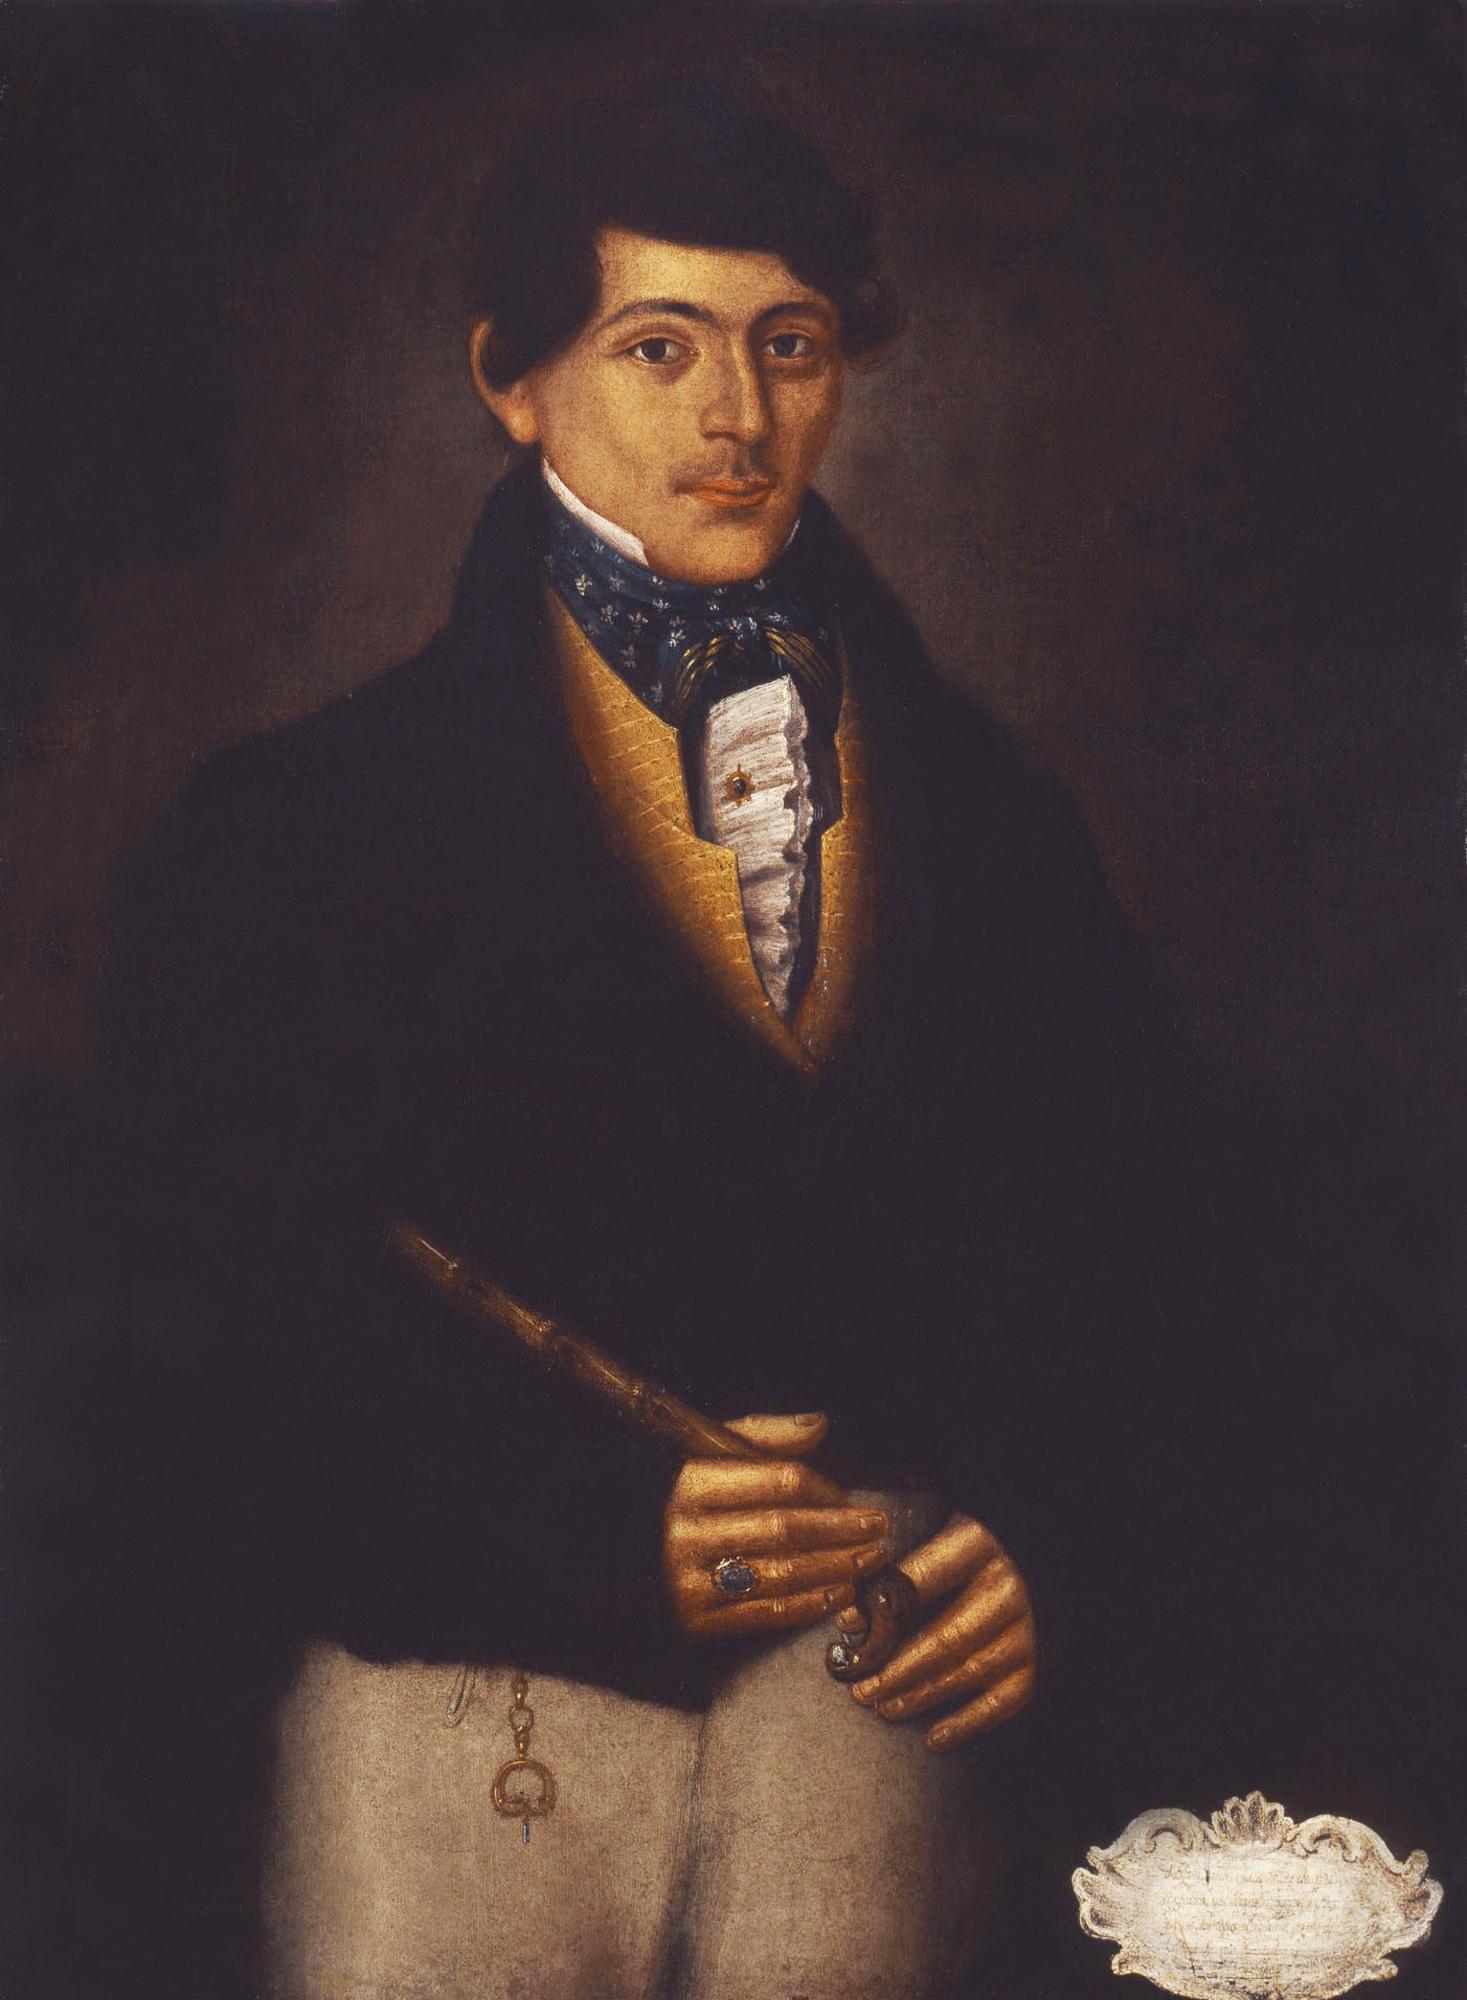 Kyriakos Xoraphas by Ioannis Korais (the younger), 1826